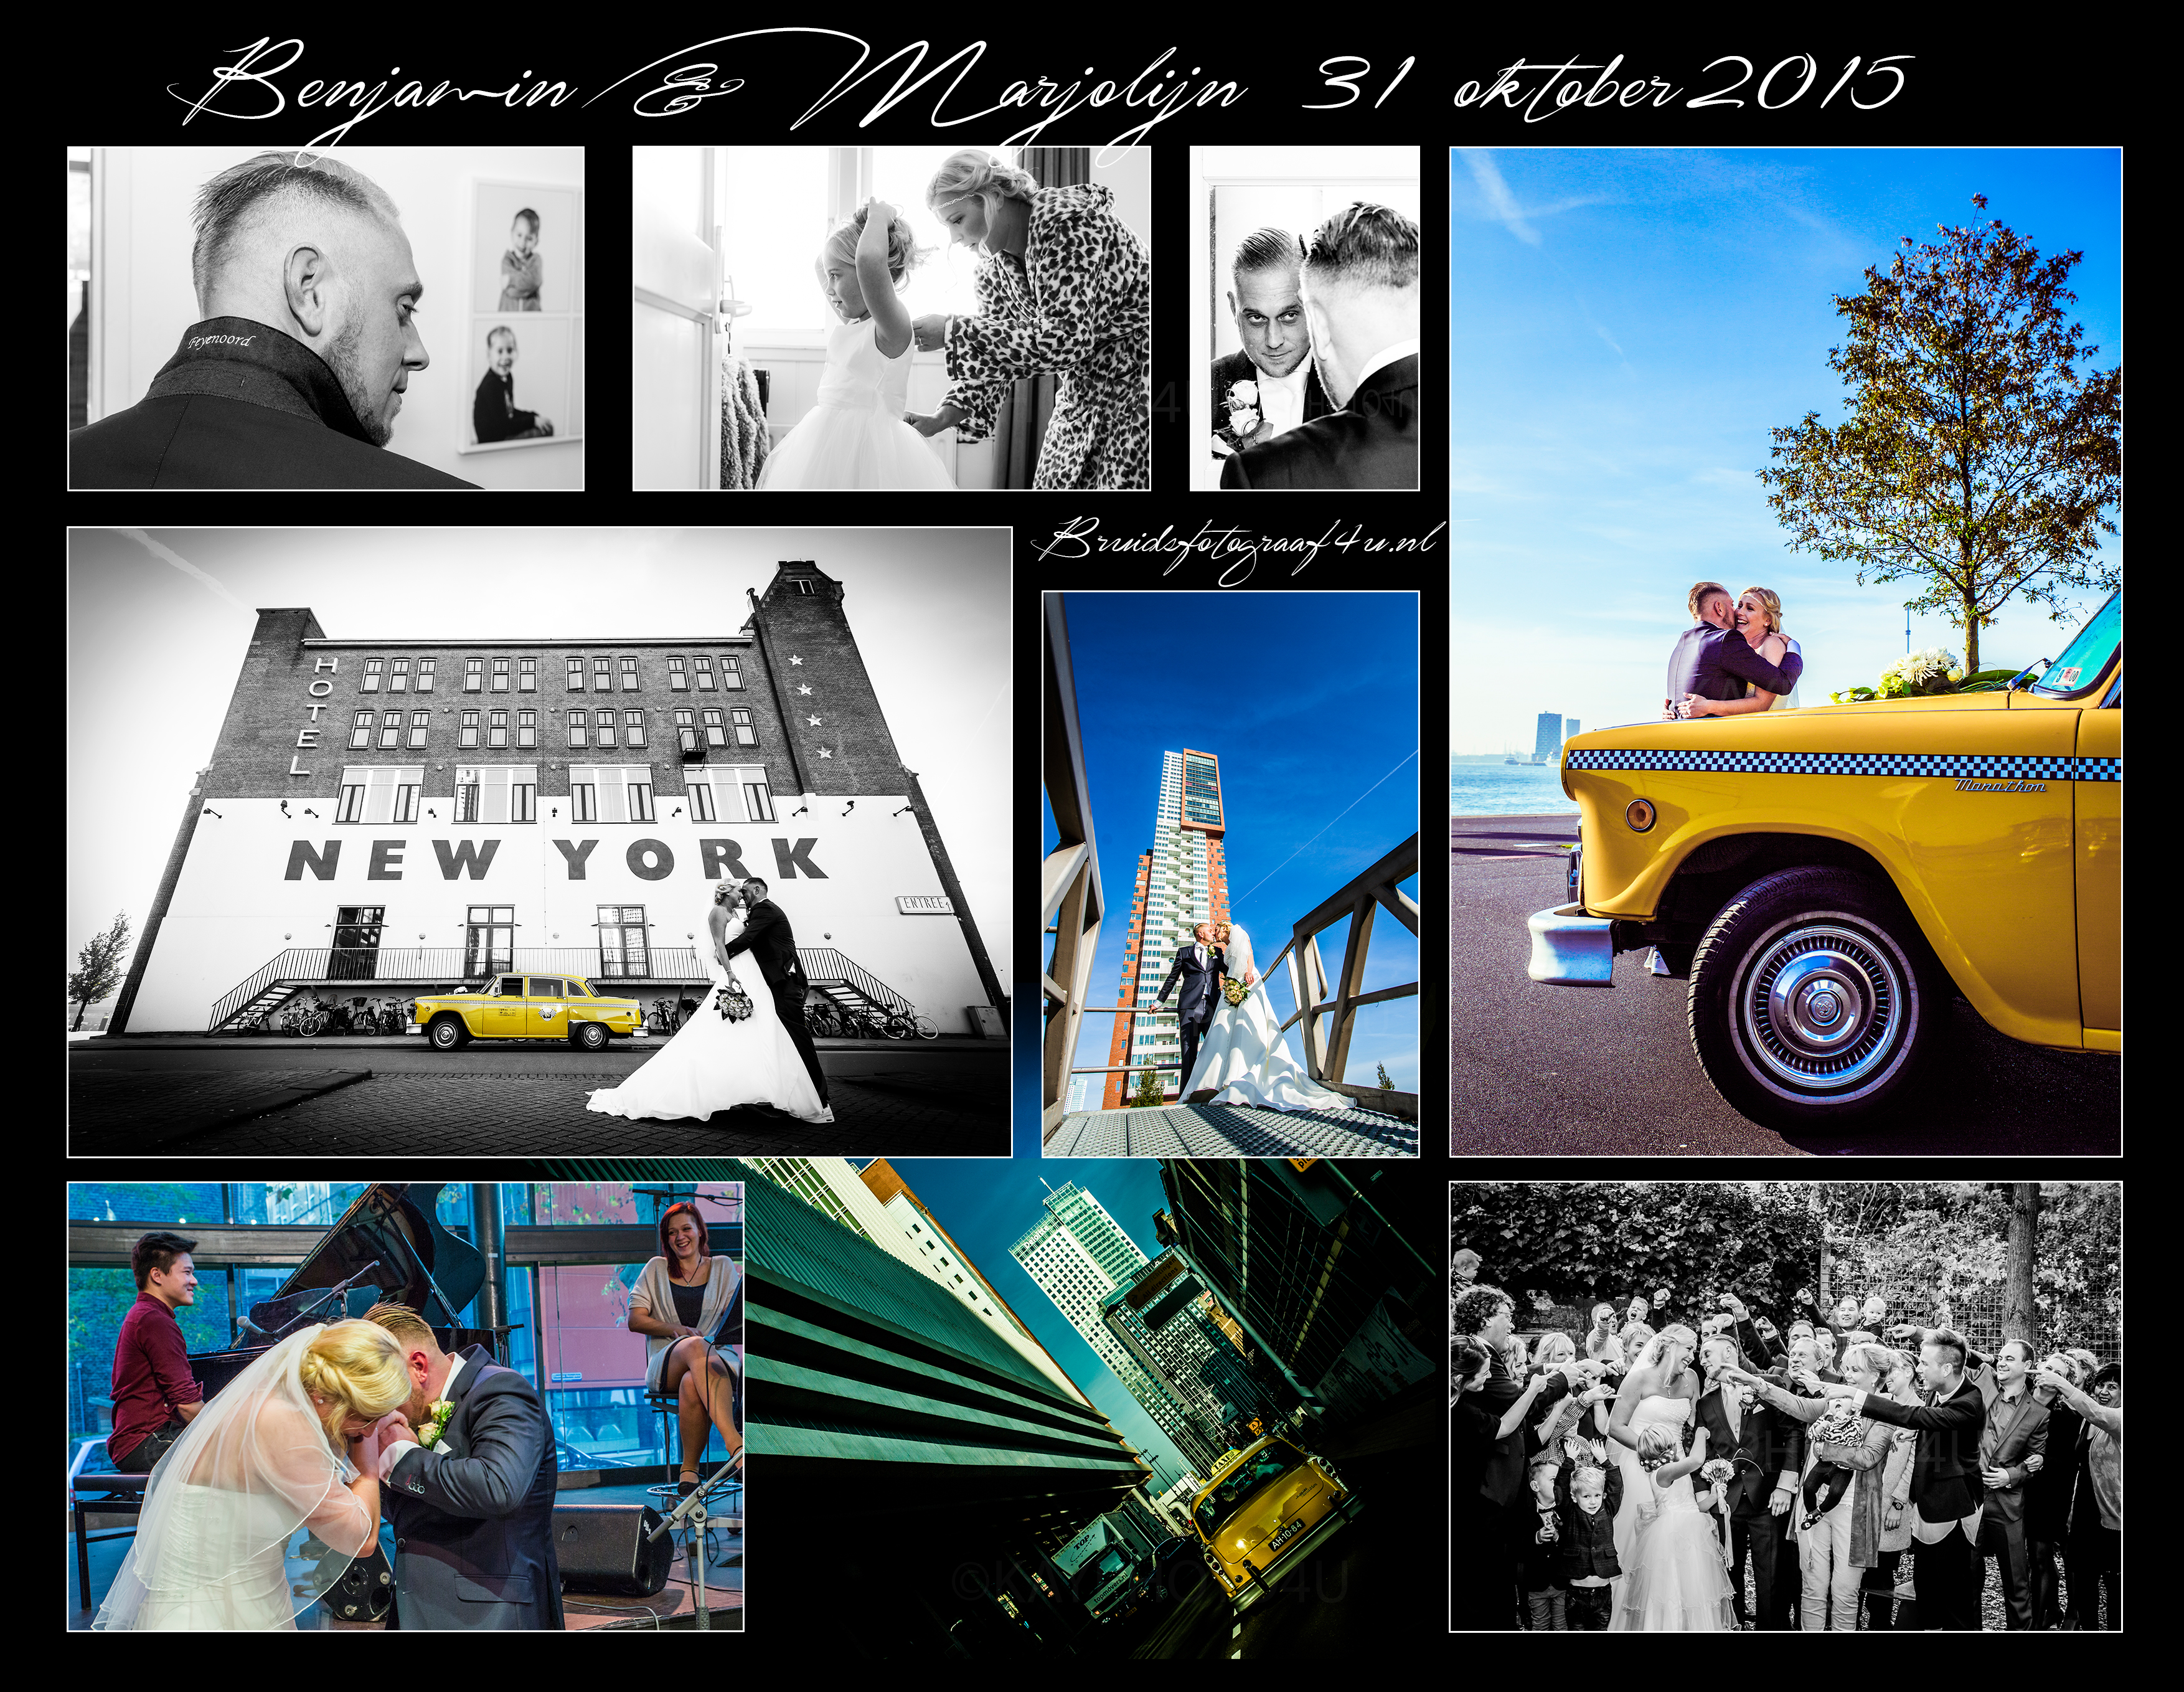 Bruidsreportage Benjamin & Marjolijn, Kayphoto4u, bruidsfotograaf4u, Bruidsfoto's Rotterdam, bruidsreportage Rotterdam, bruidsreportage, bruidsreportage Amersfoort, bruidsreportage Vathorst, Trouwfotograaf Amersfoort, Trouwfotograaf Rotterdam,  fotograafofferte, fotograaf offerte, trouwfotograaf offerte, bruidsfotograaf offerte